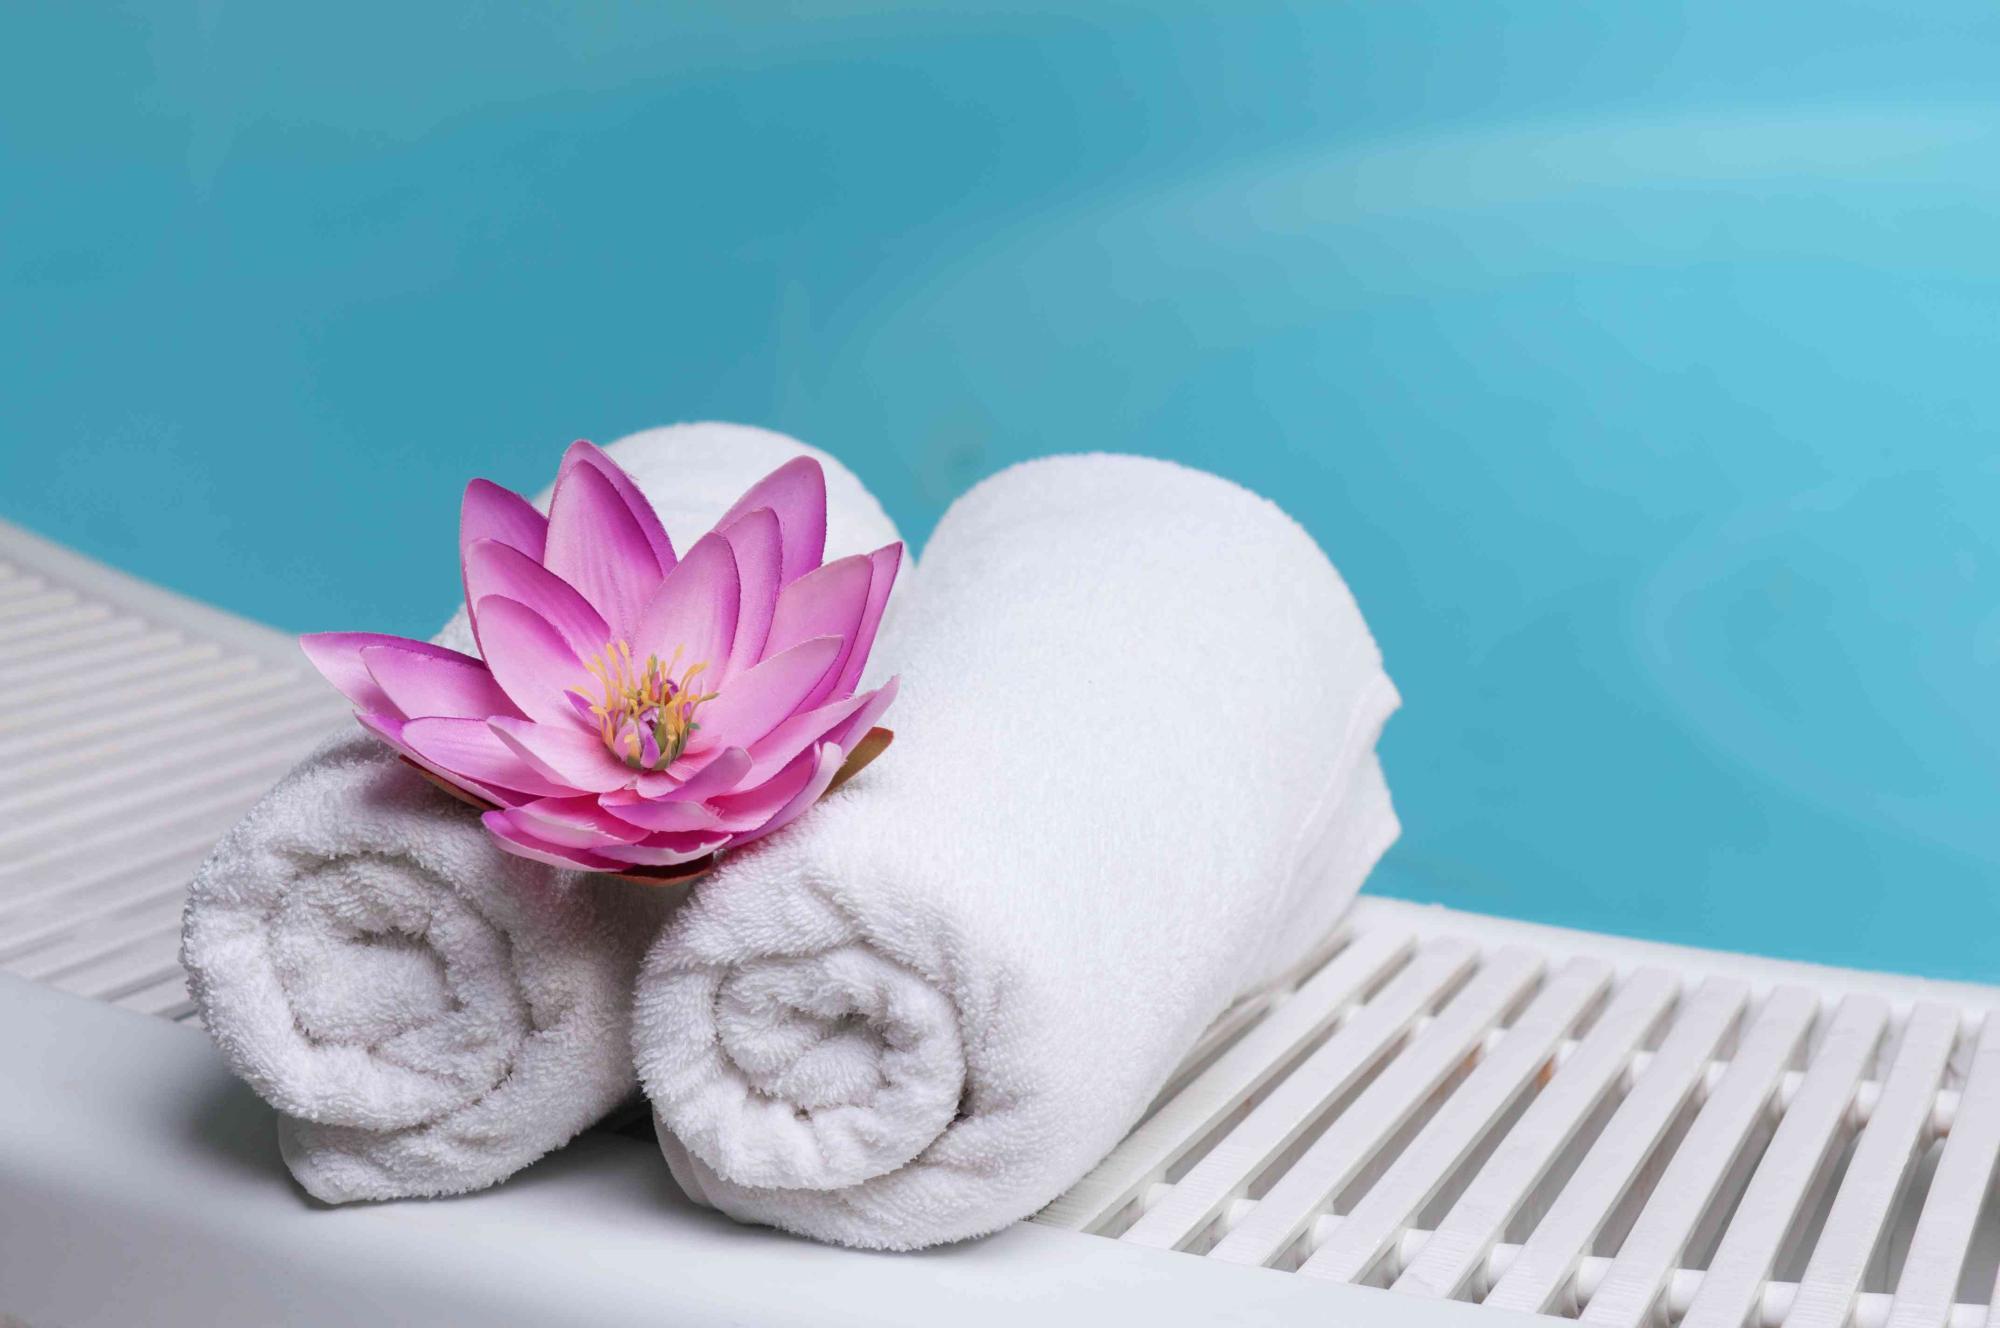 Foot Reflexology Back Massage Hot Stone Massage Smithtown Ny